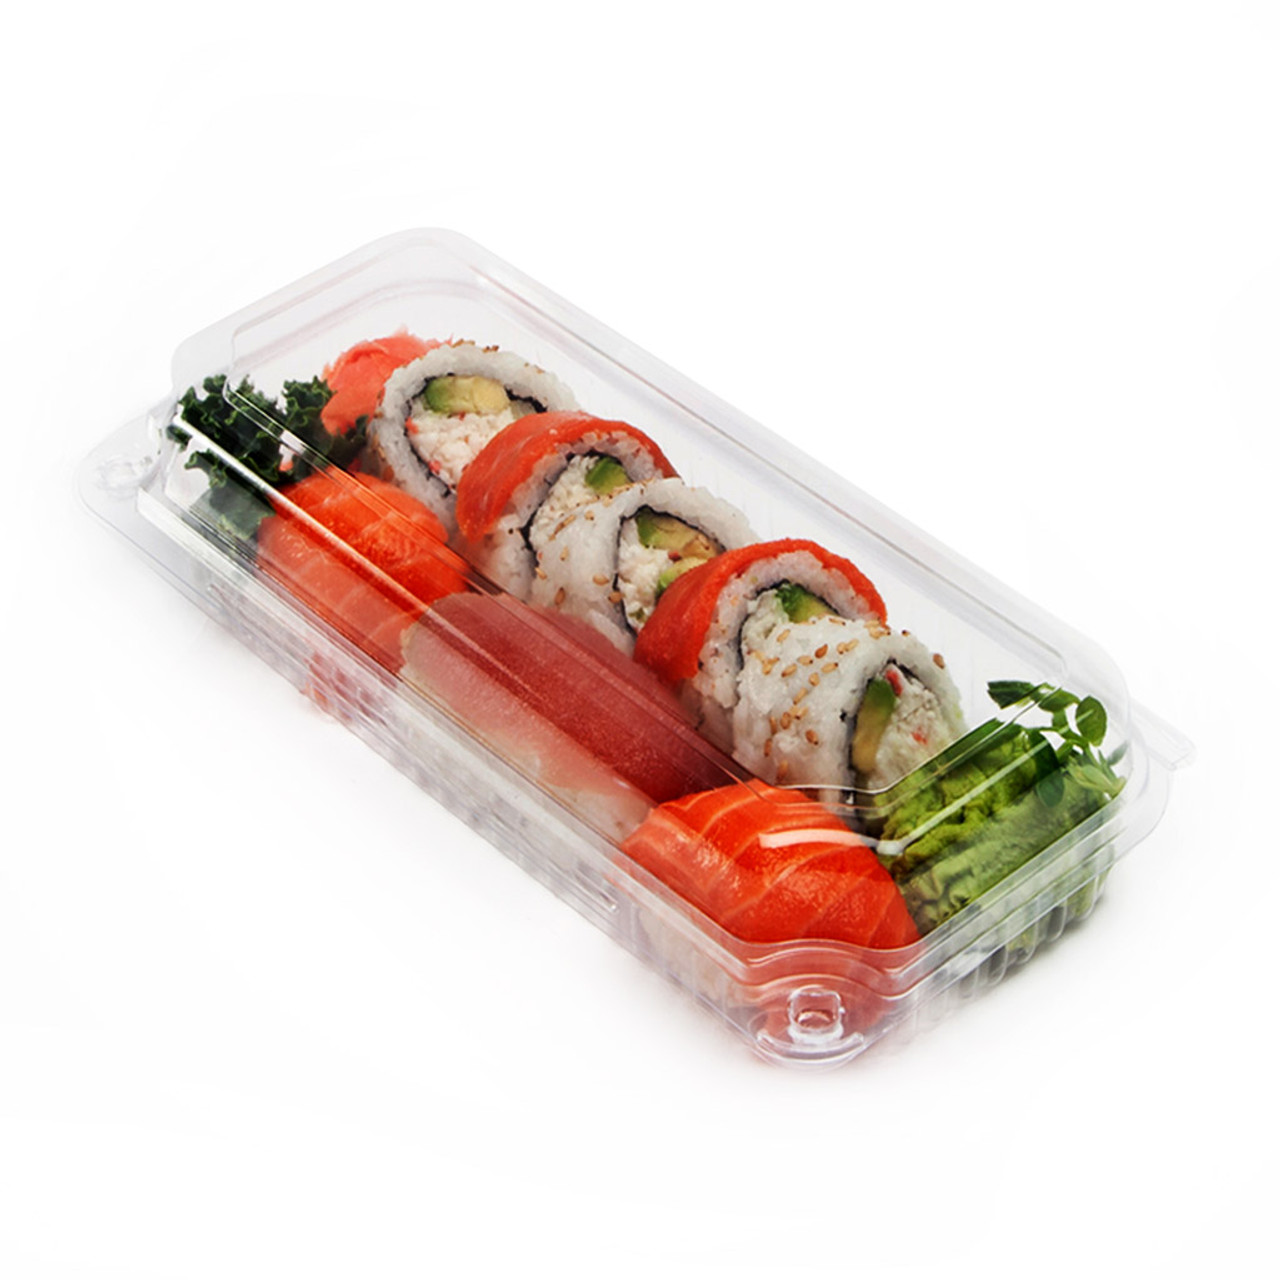 Wrap, Sushi, Veggies Hinged Utility Container